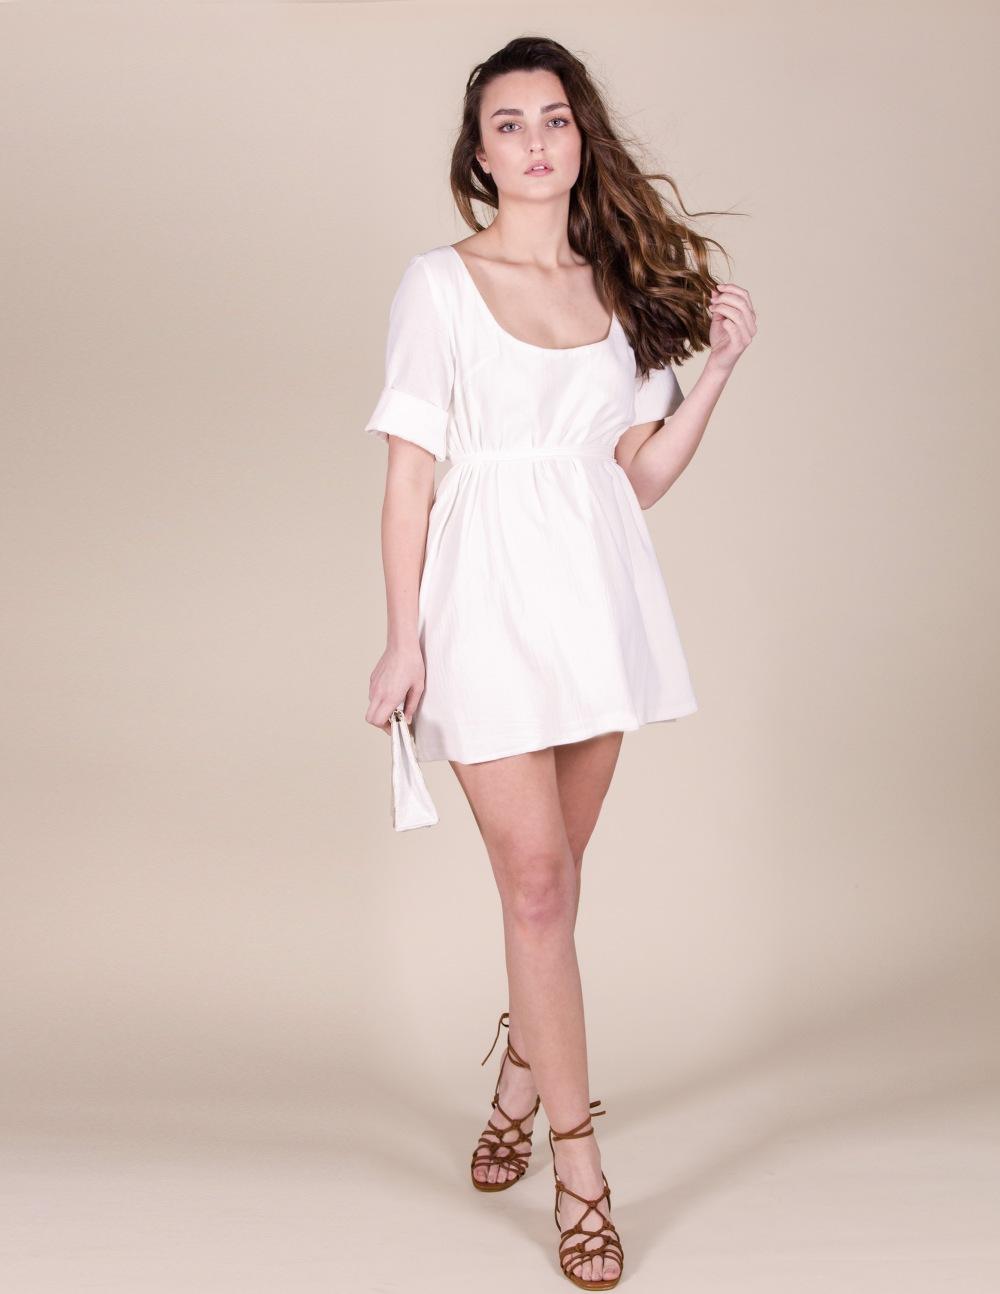 Alyssa Nicole The Kylie Dress 1